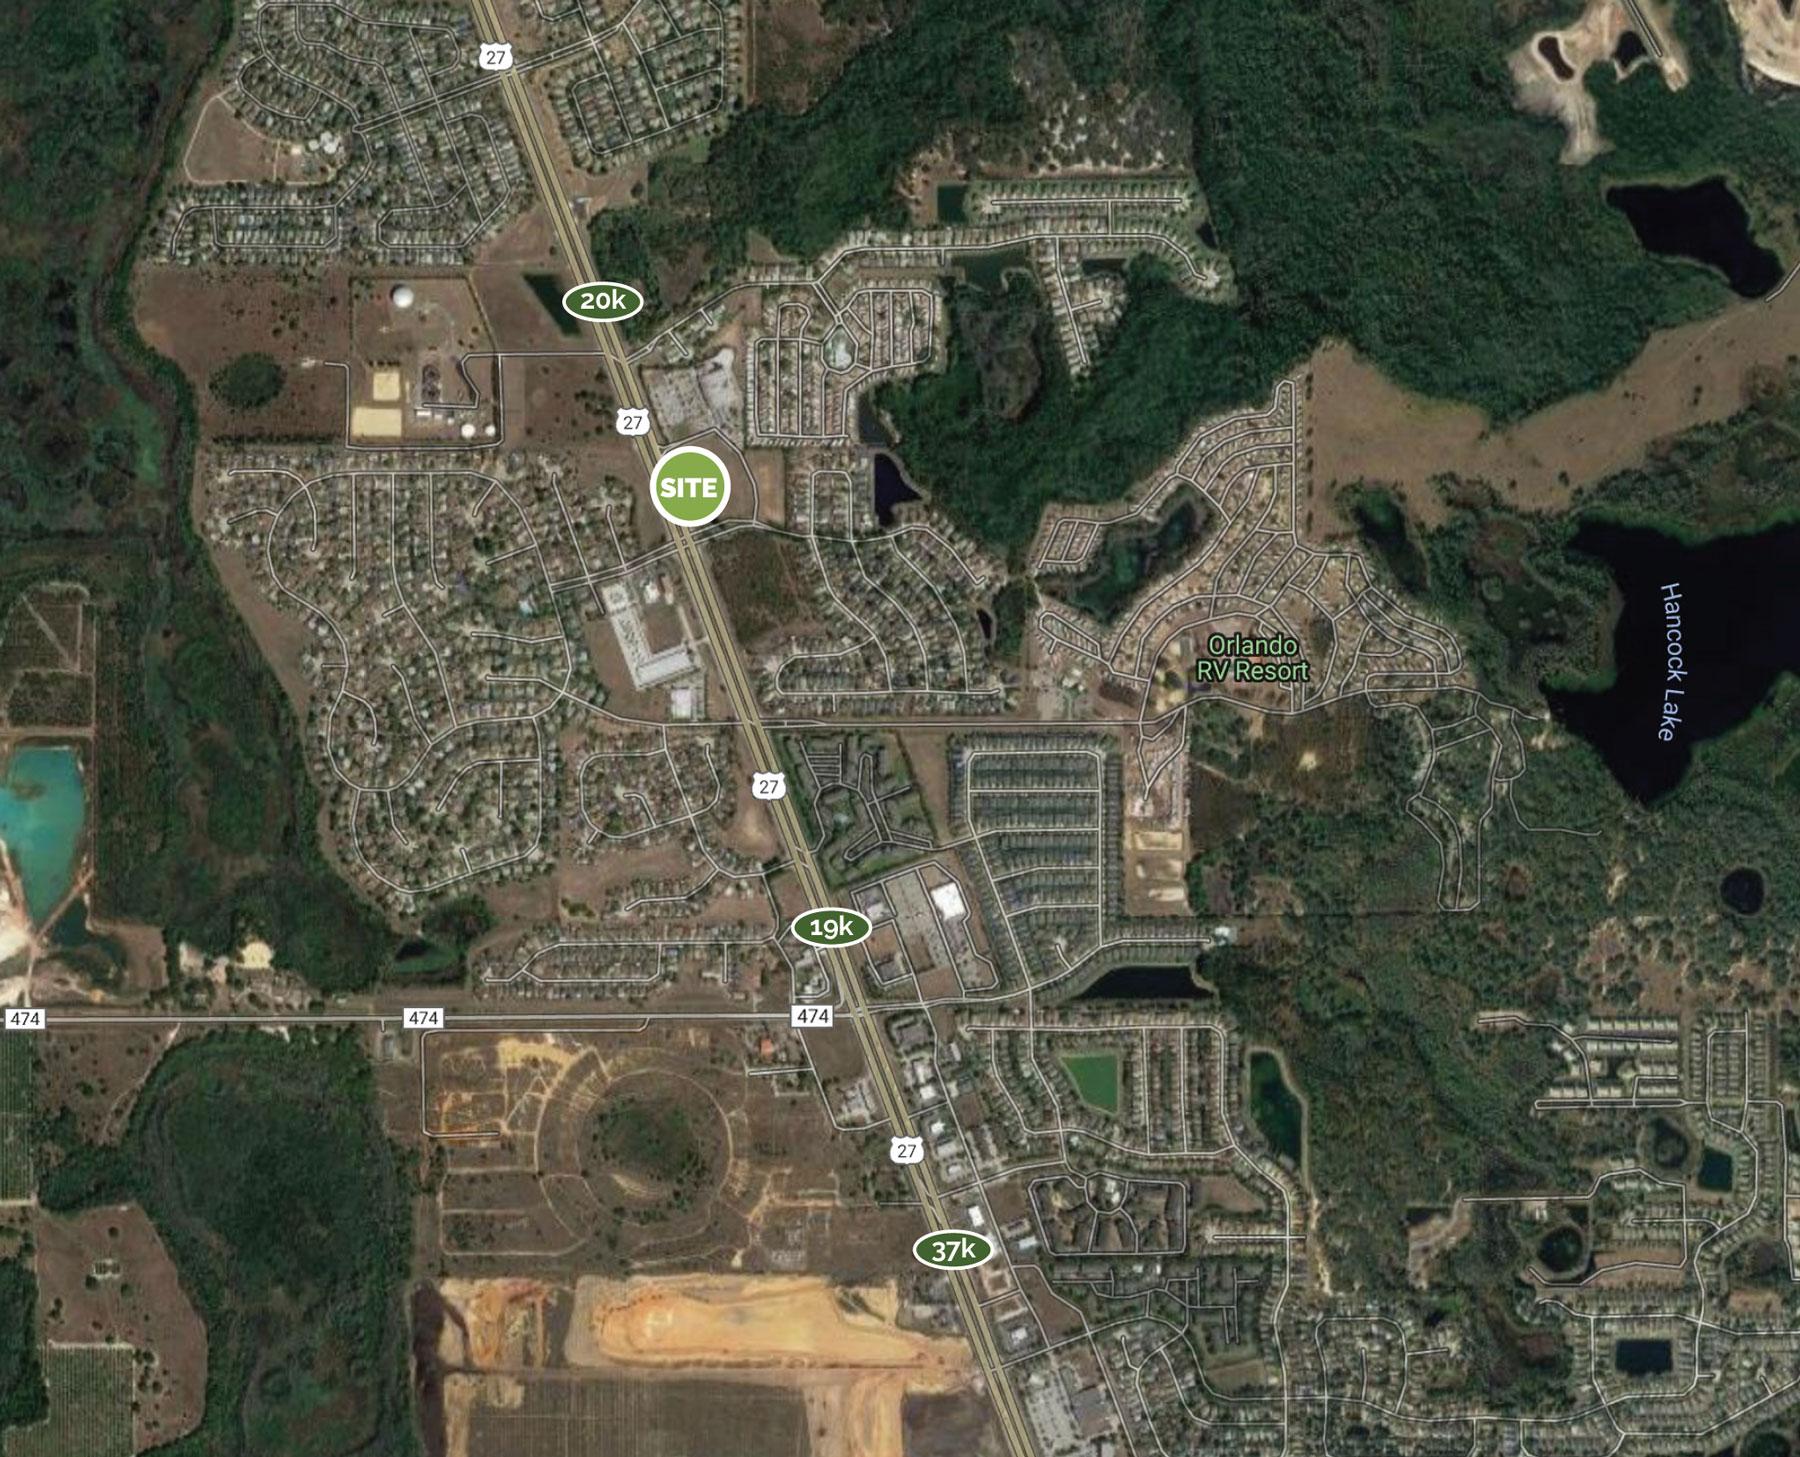 Clermont-real-estate-development-5